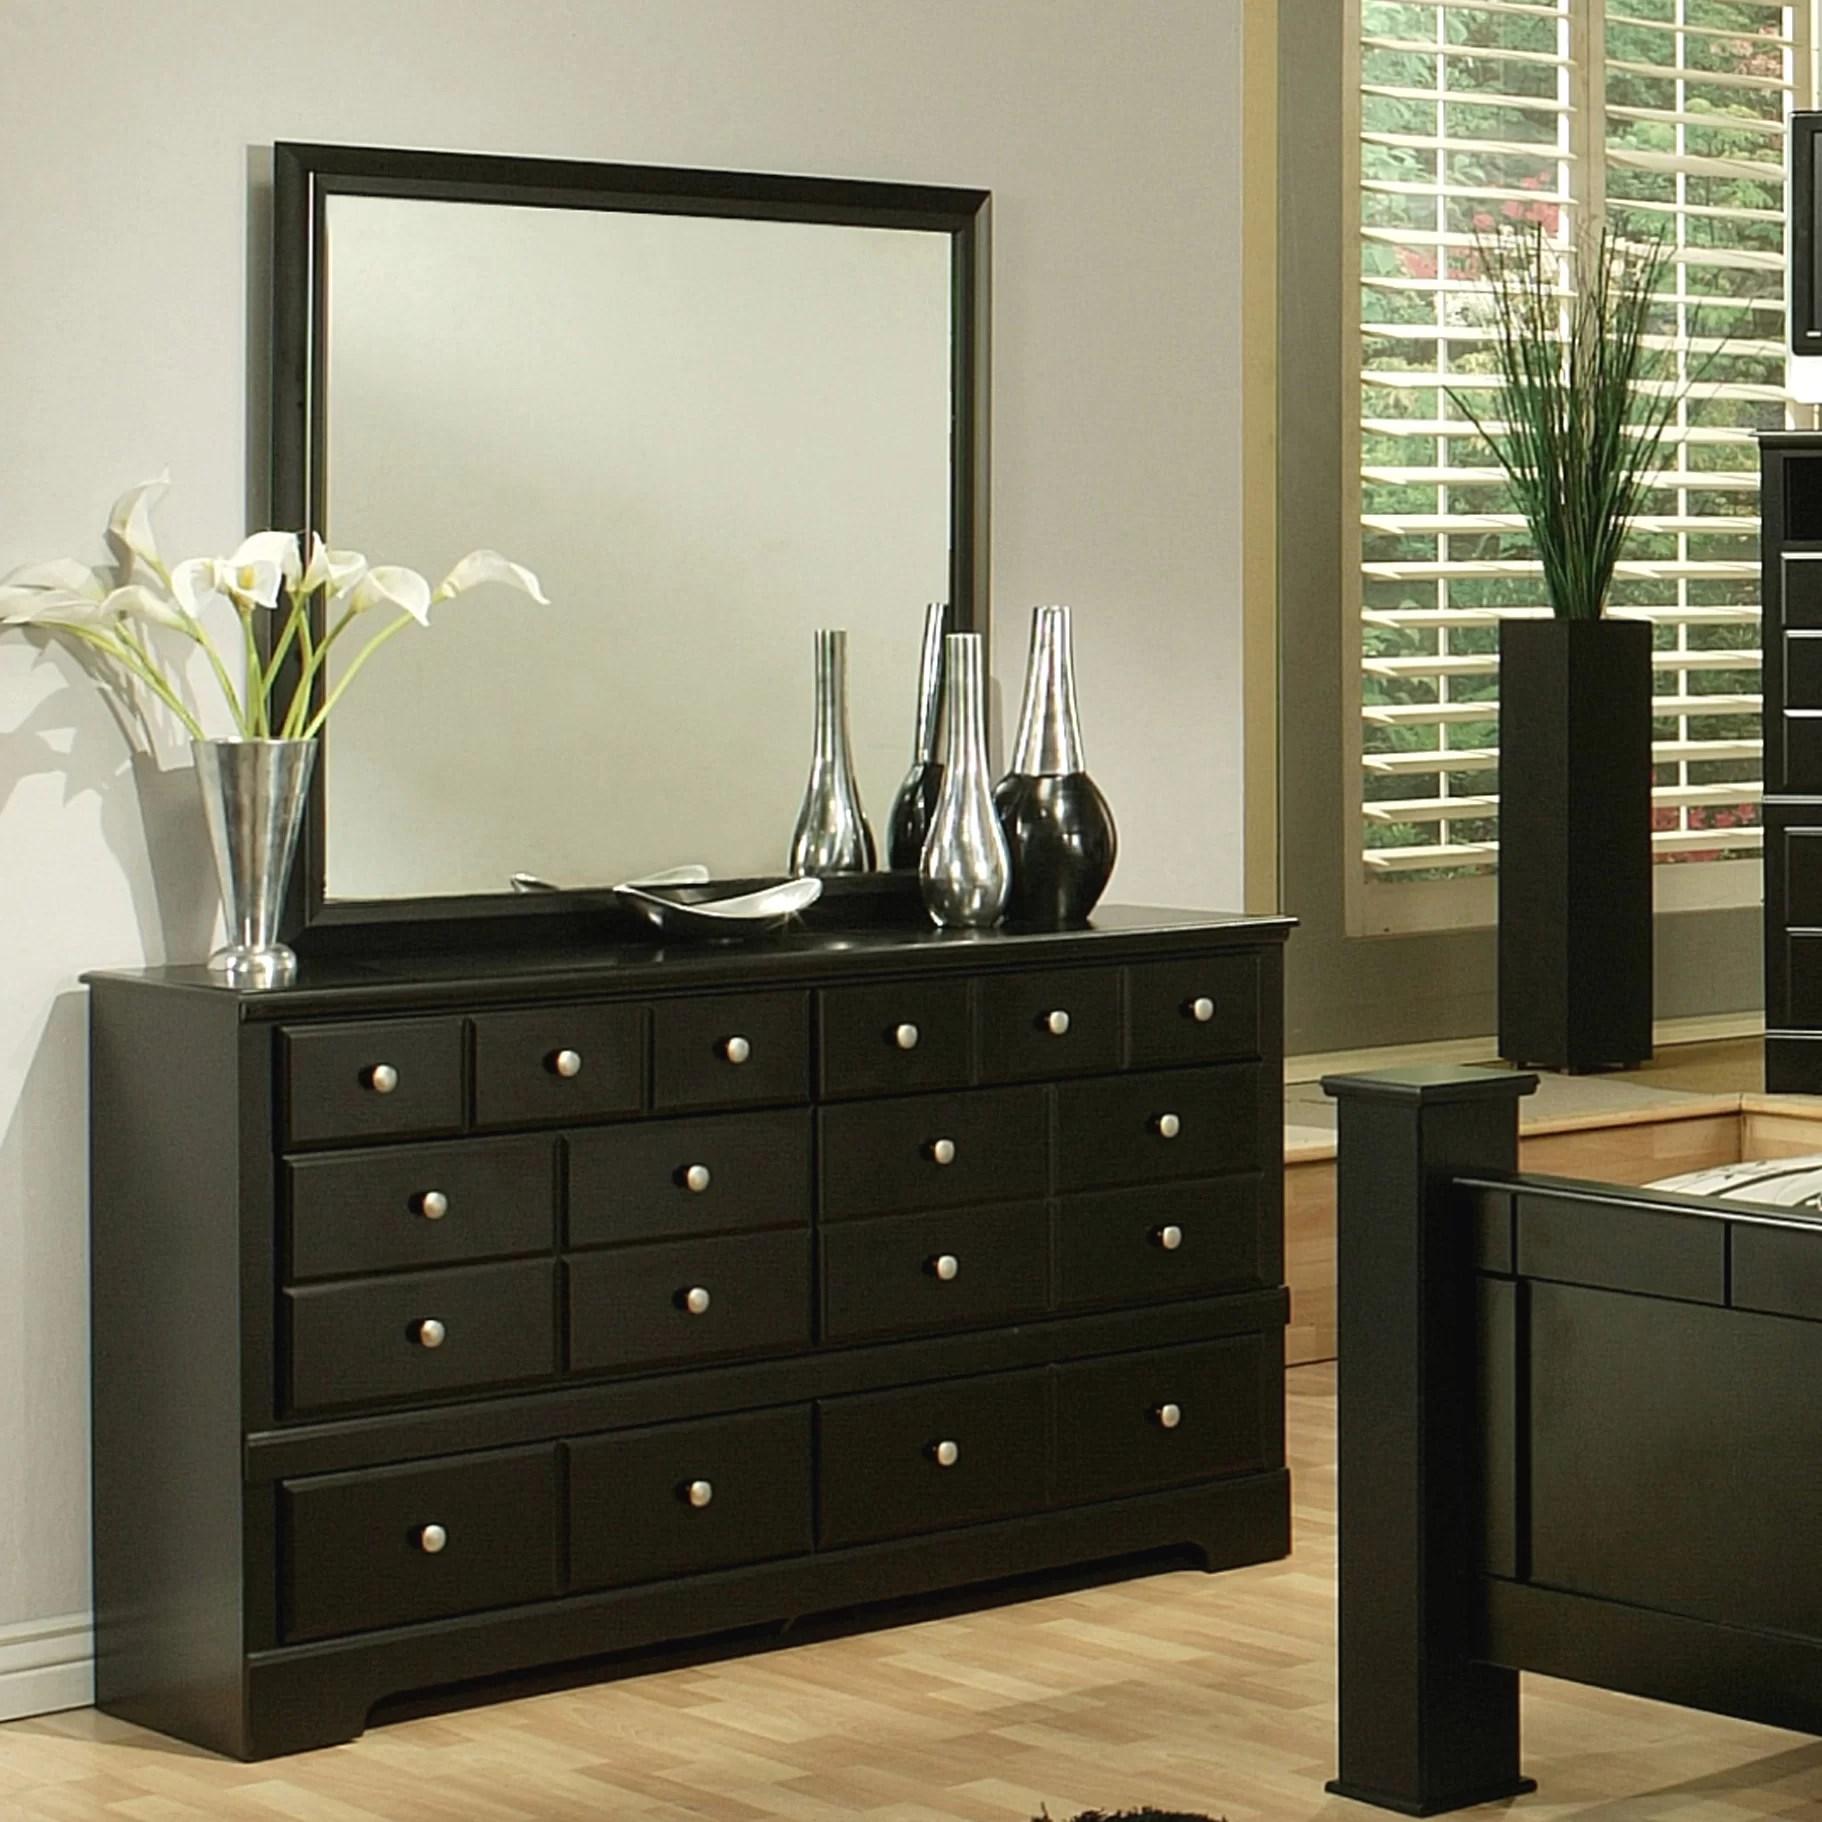 Sandberg Furniture Elena 6 Drawer Dresser with Mirror  Reviews  Wayfair